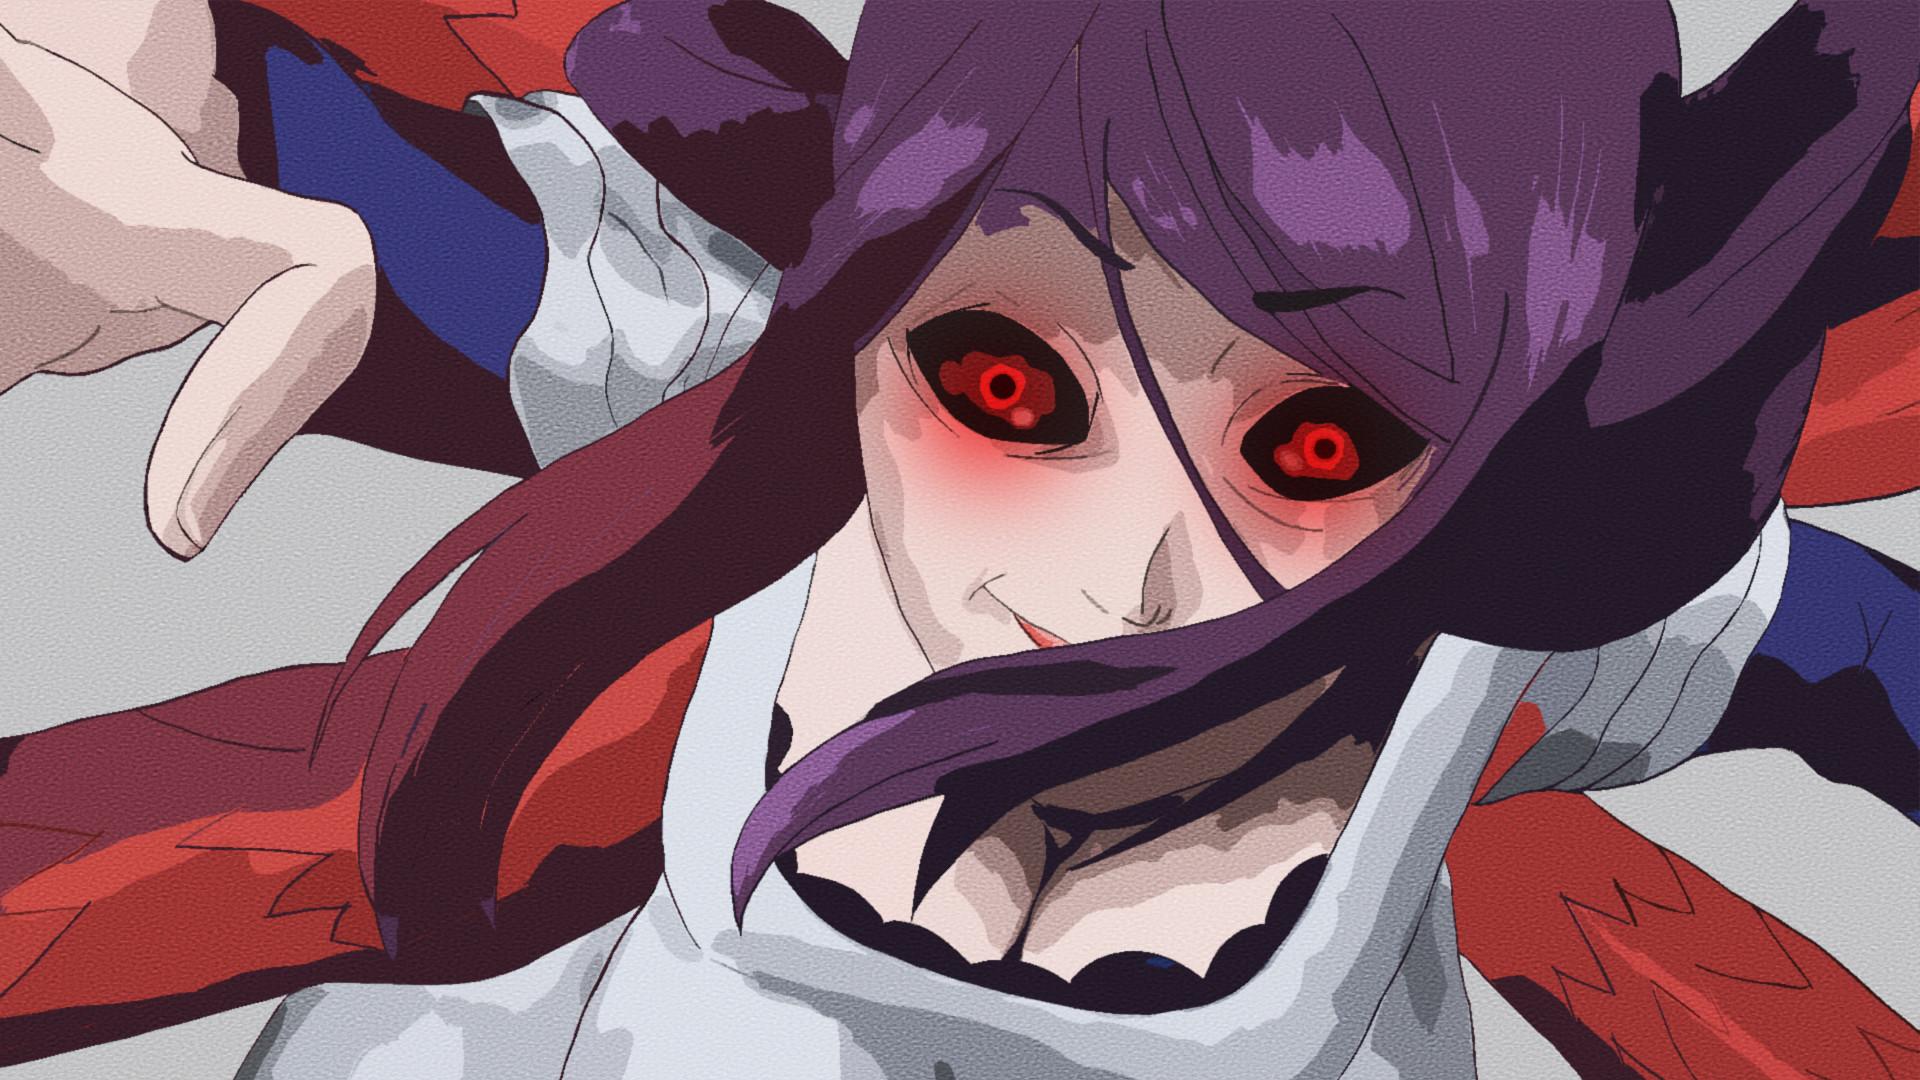 … PaintforfunYoutube Tokyo Ghoul- RIze [Wallpaper] by PaintforfunYoutube